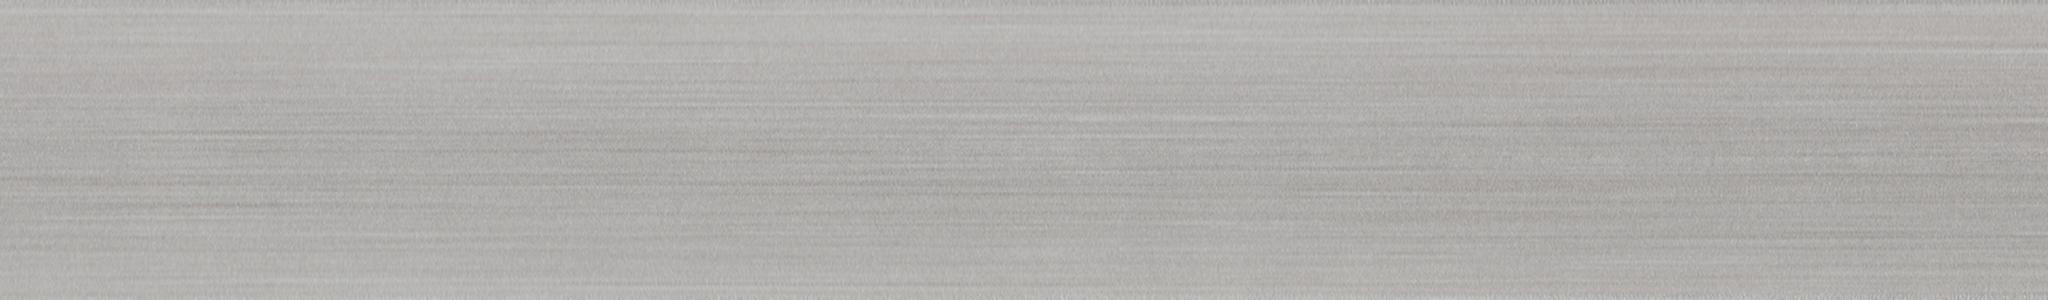 HD 290279 Акрил 3D кромка сталь